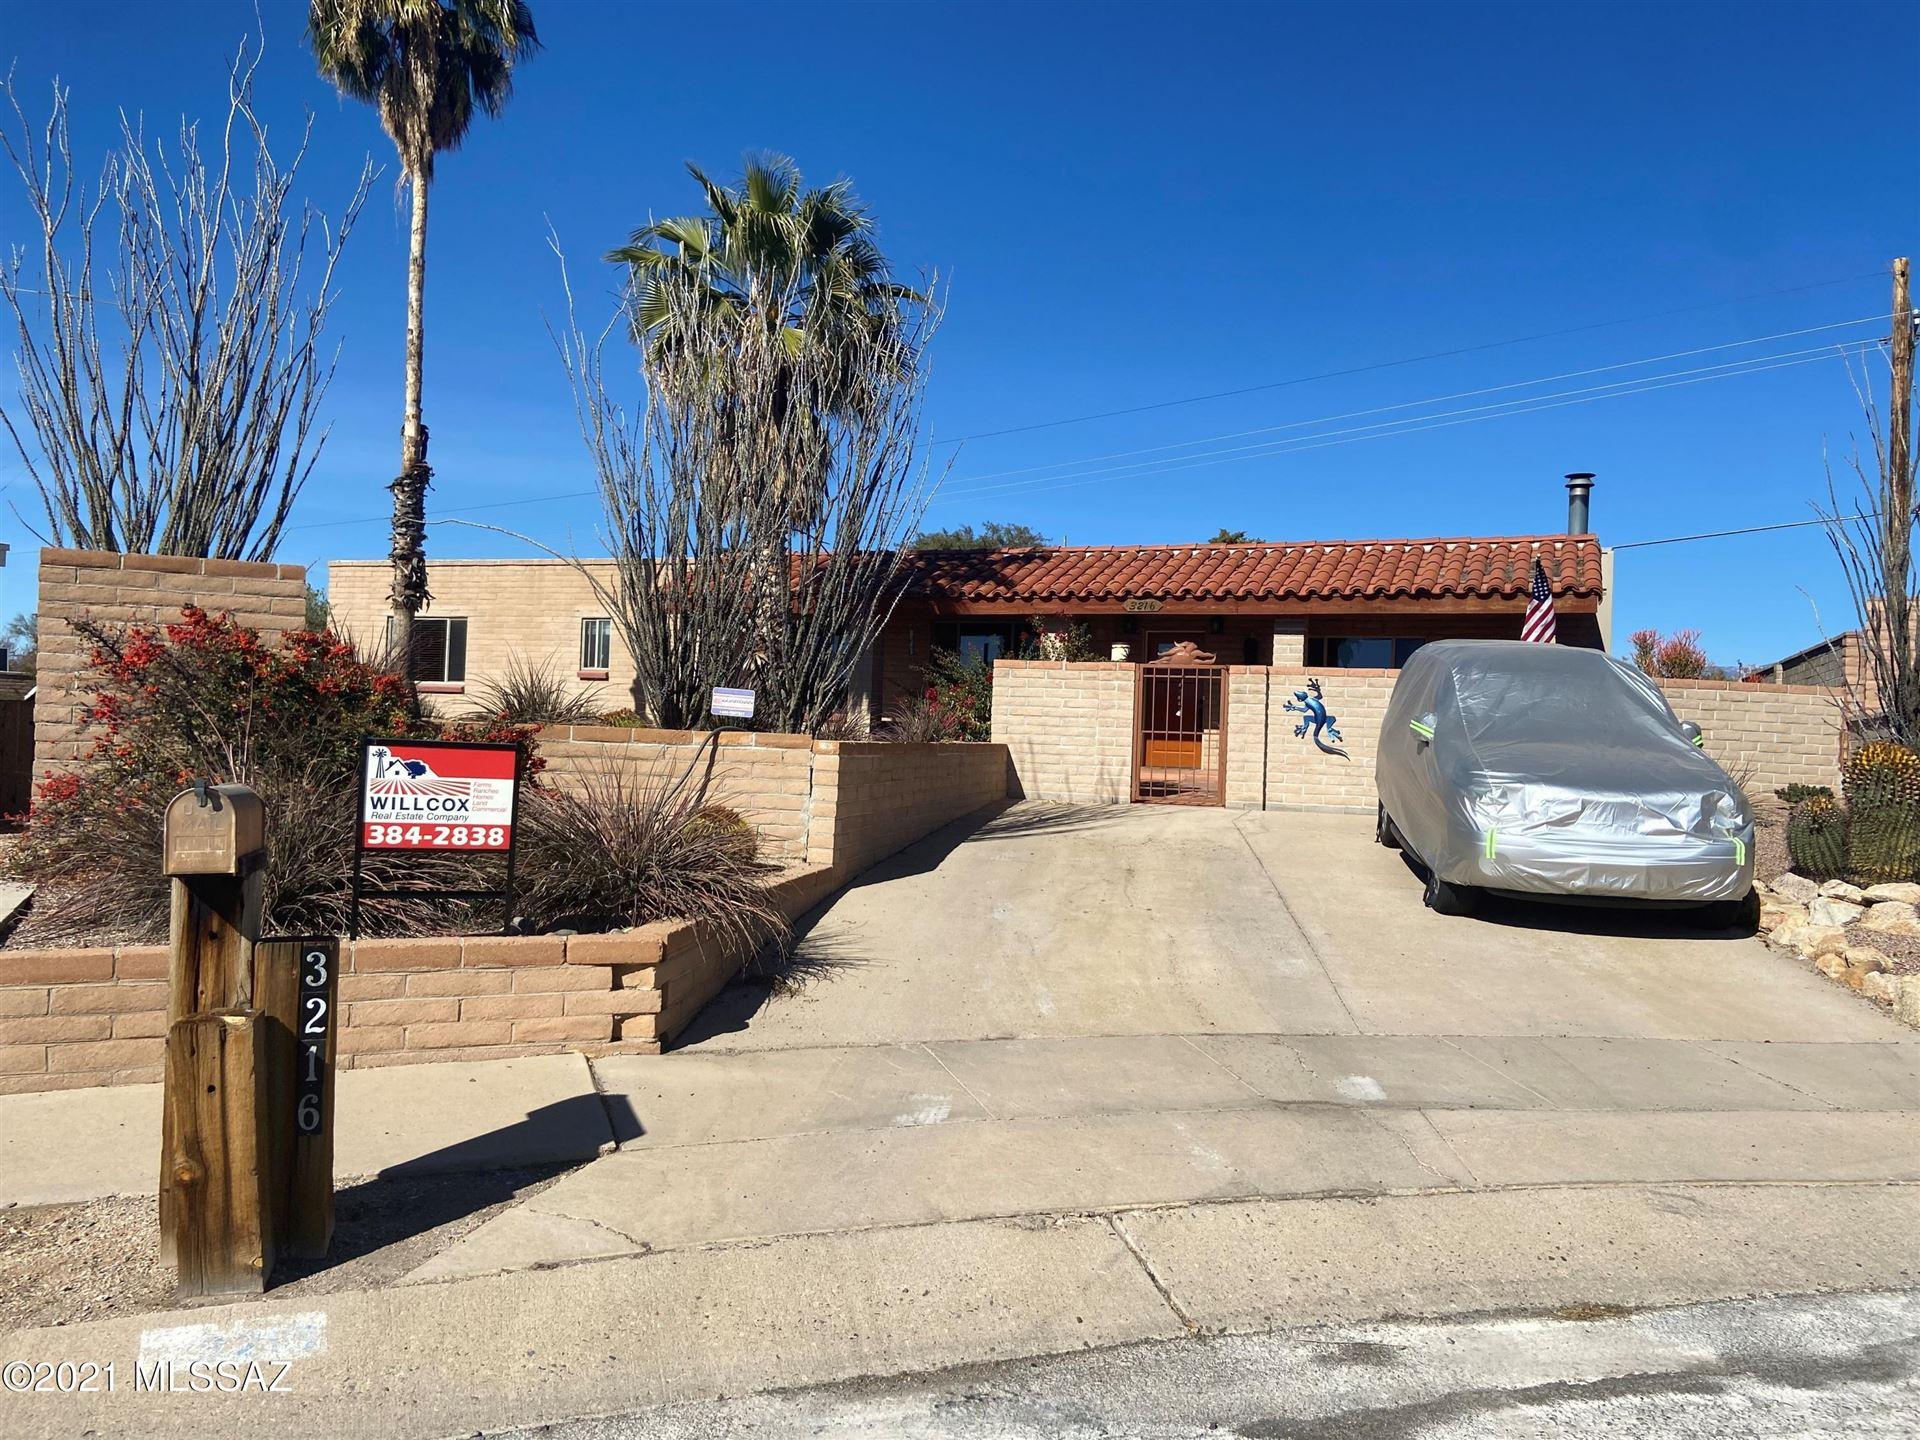 3216 S Winona Circle, Tucson, AZ 85730 - MLS#: 22100675